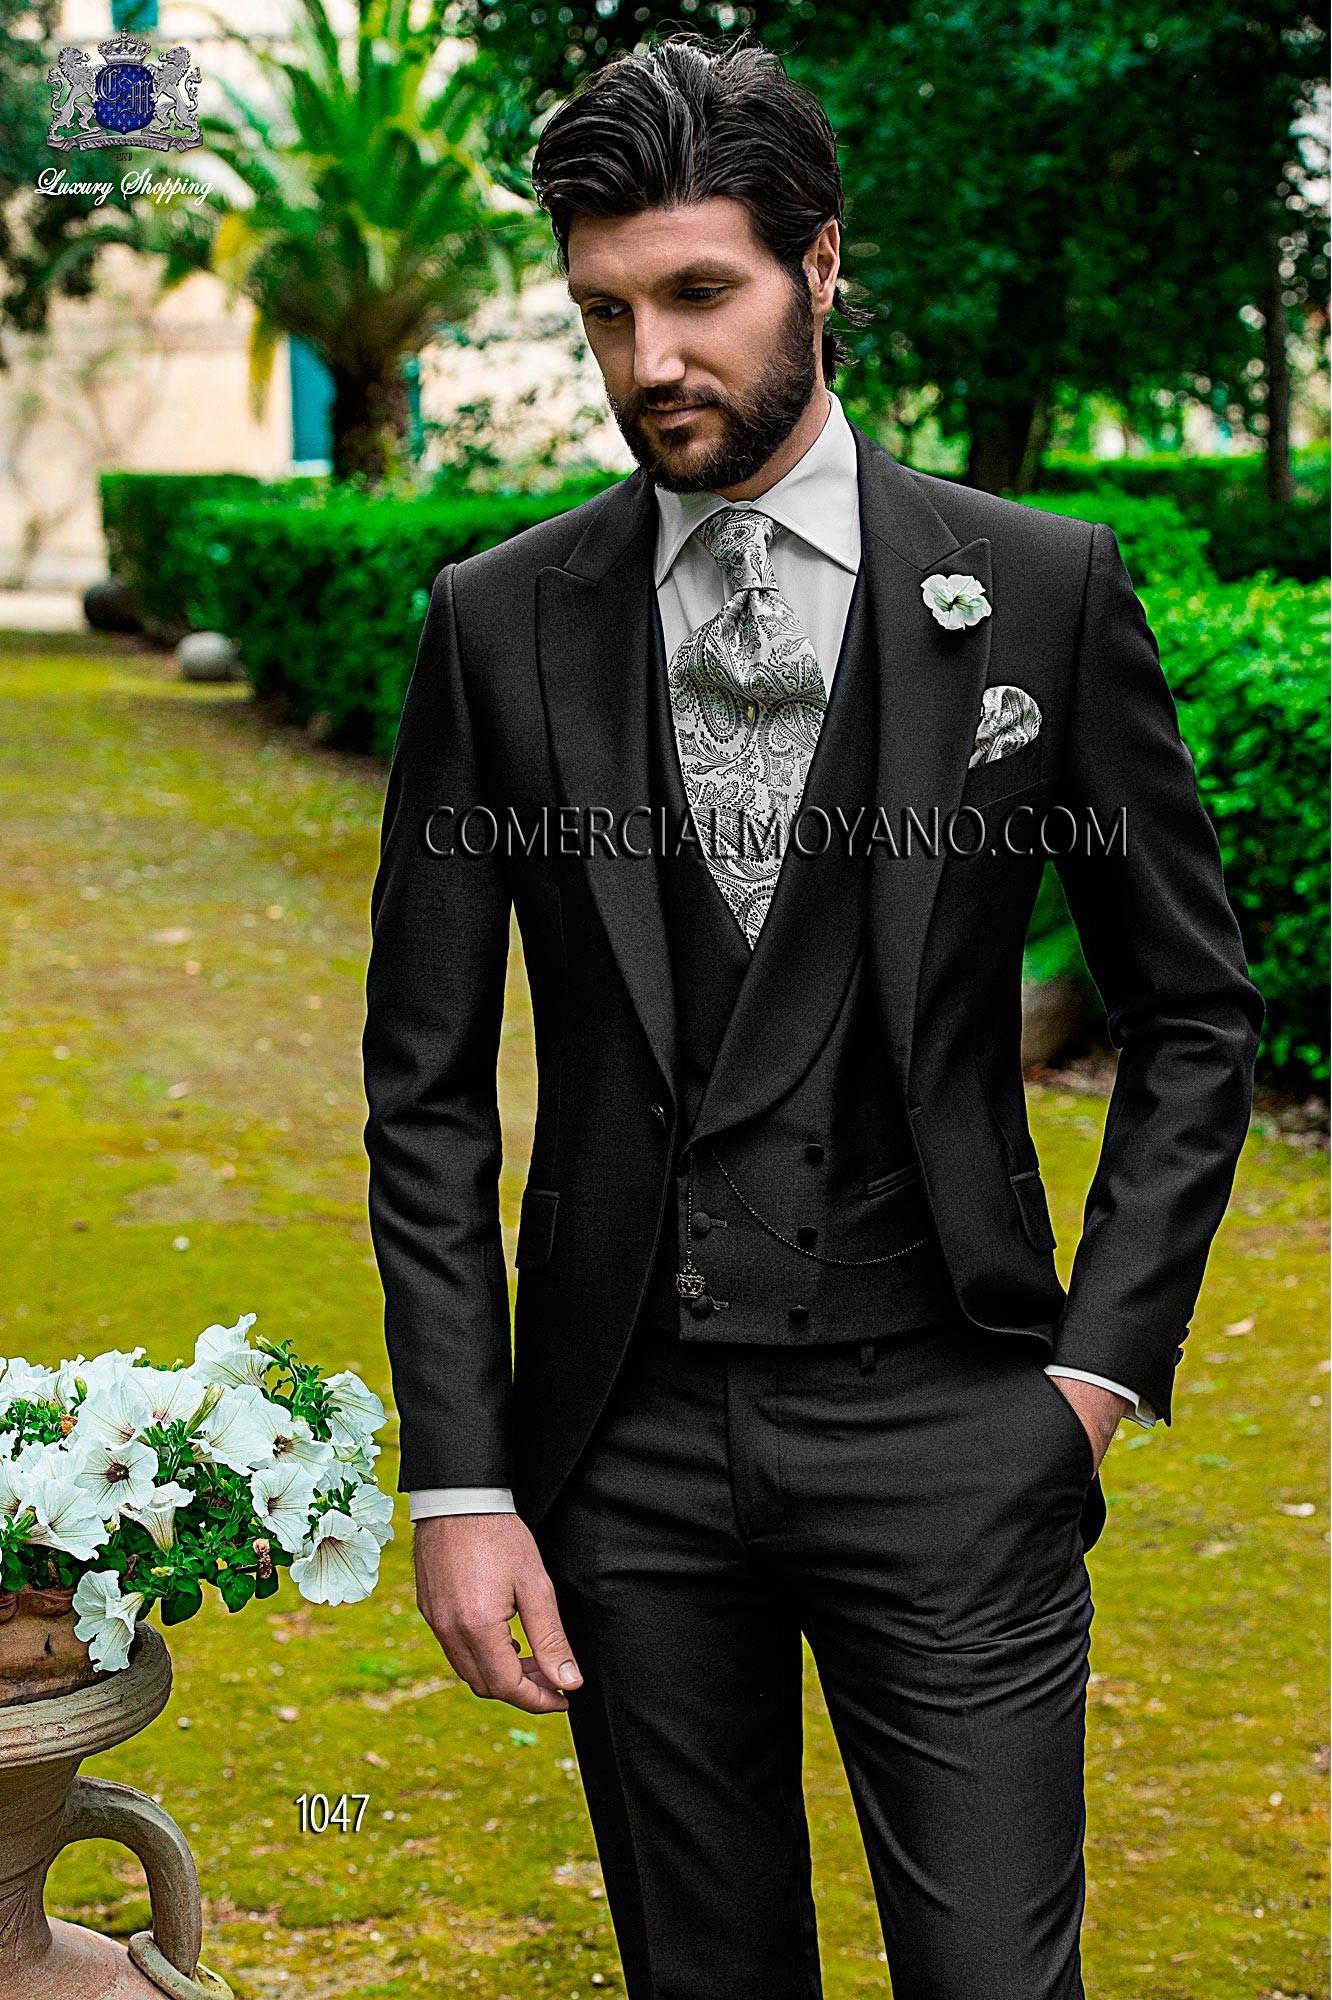 Traje de novio moderno gris modelo: 1047 Ottavio Nuccio Gala colección Fashion